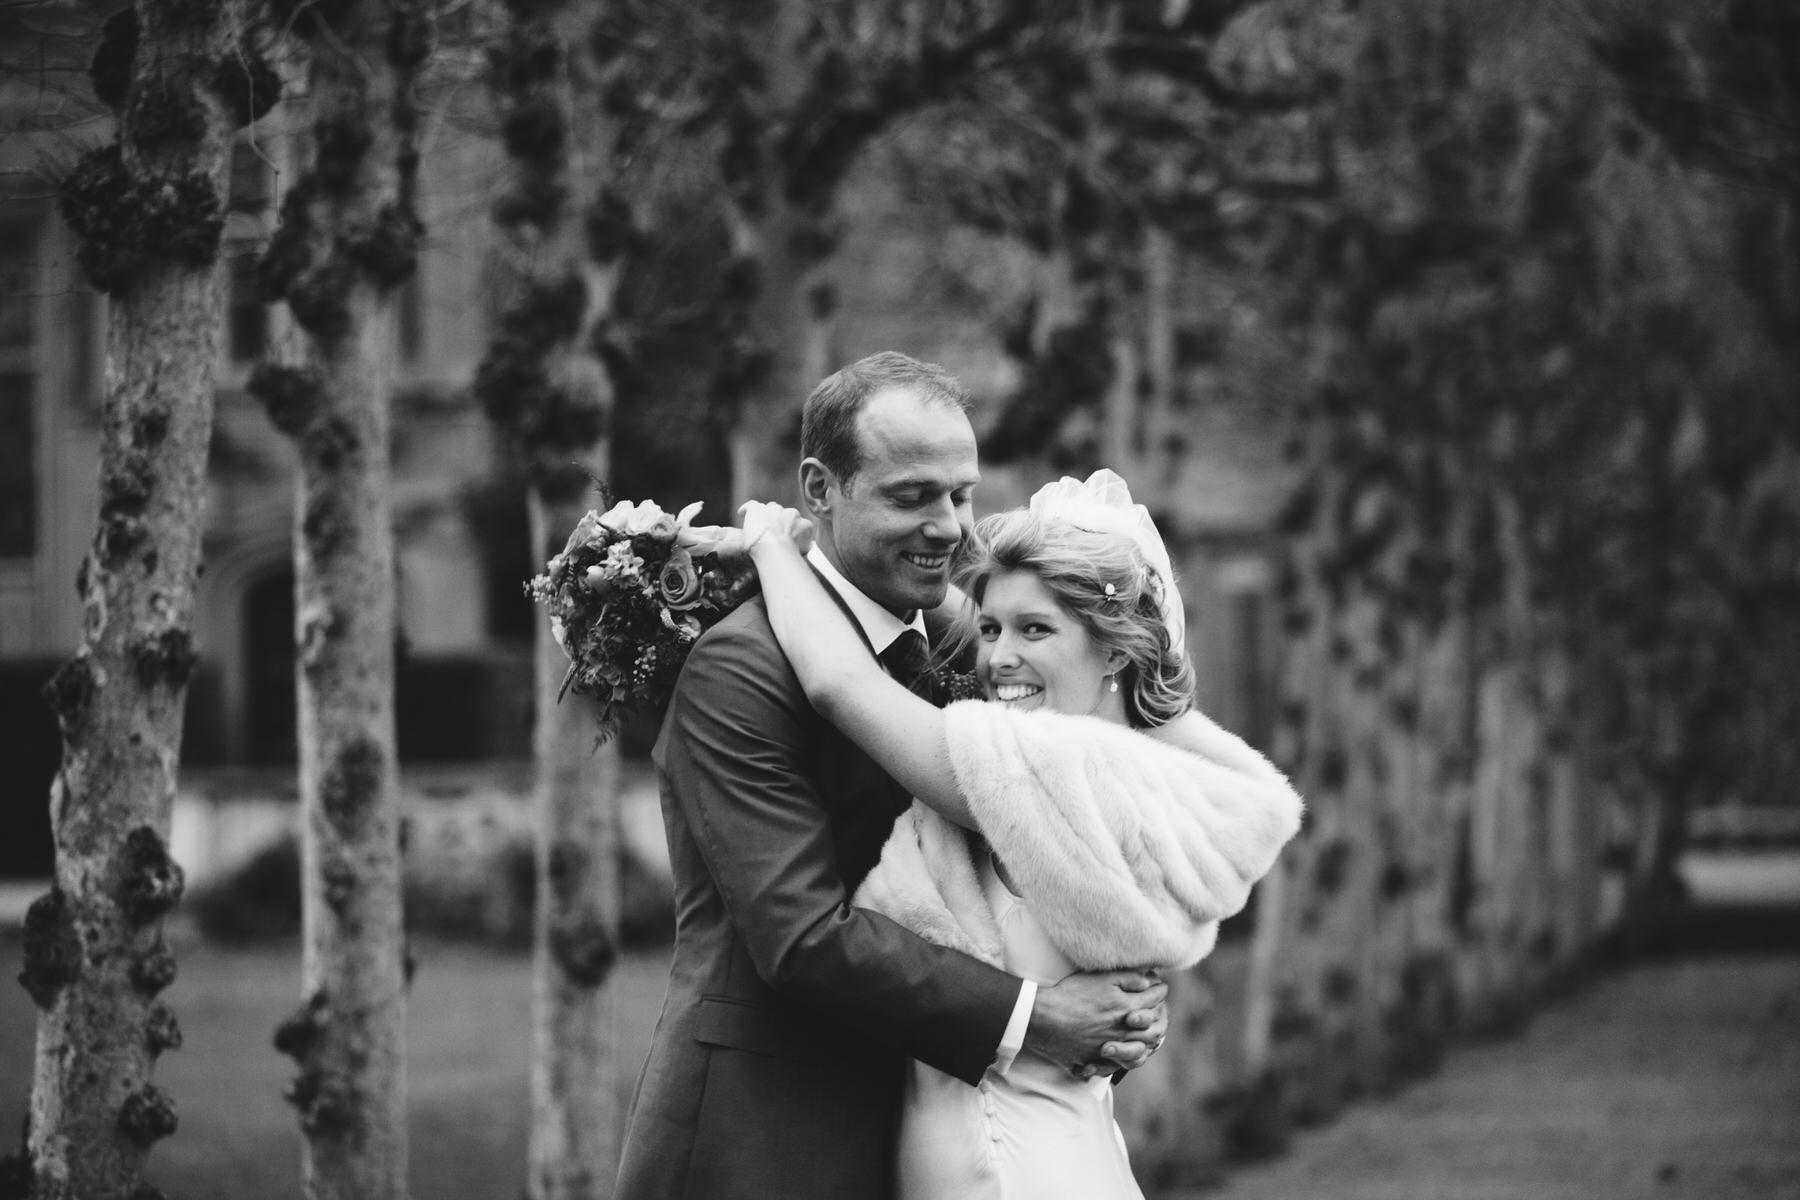 BW winter wedding couple bridal photos.jpg